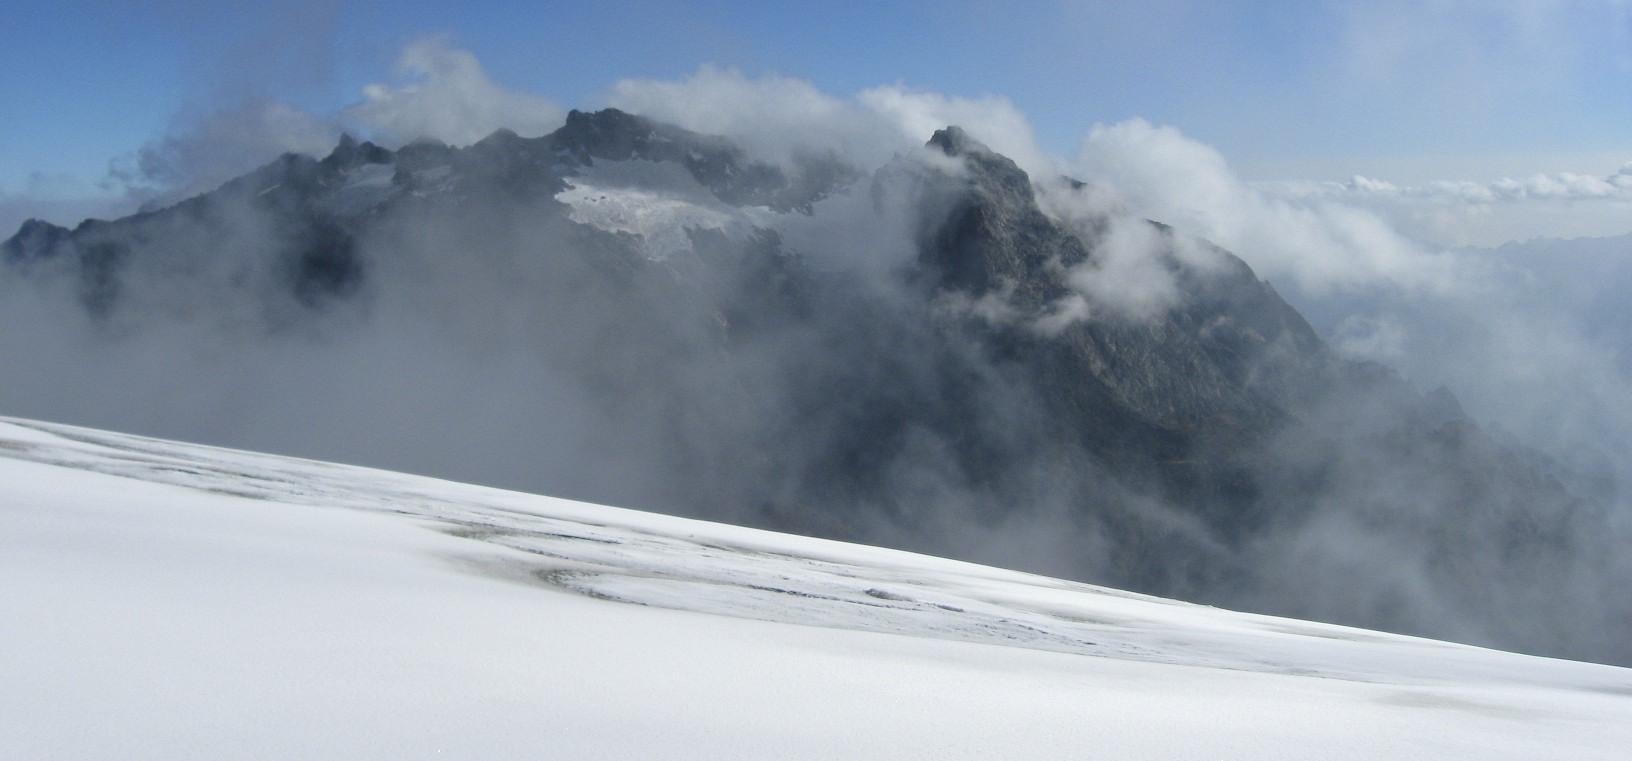 Mt. Baker from the Margarita Glacier